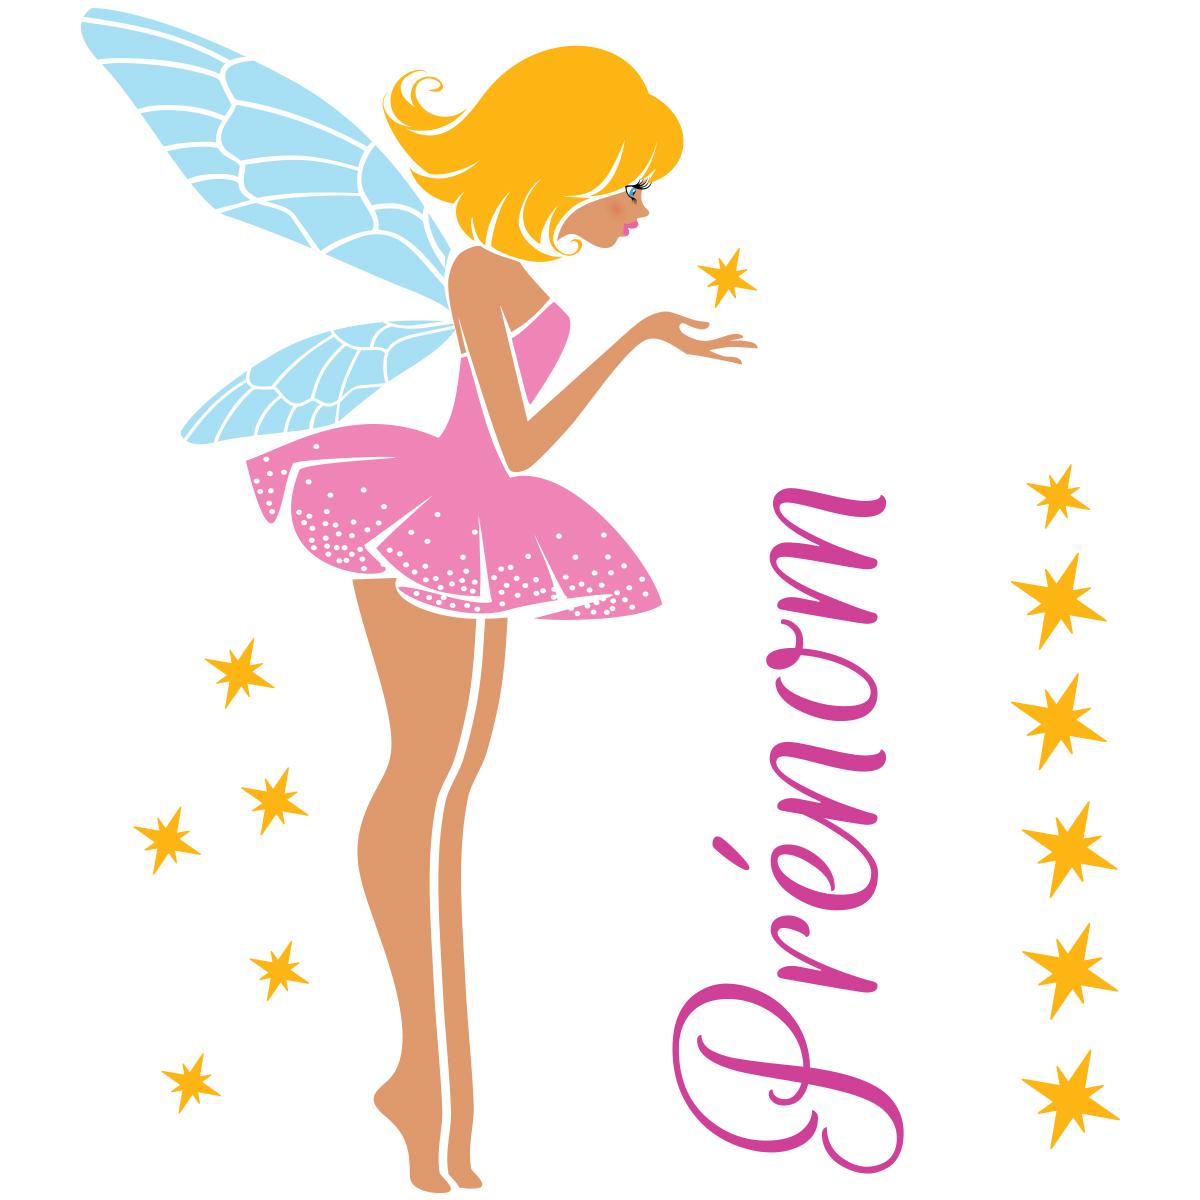 Sticker pr nom personnalis f e de l 39 amour stickers filles f es ambiance sticker - Stickers muraux personnalise ...